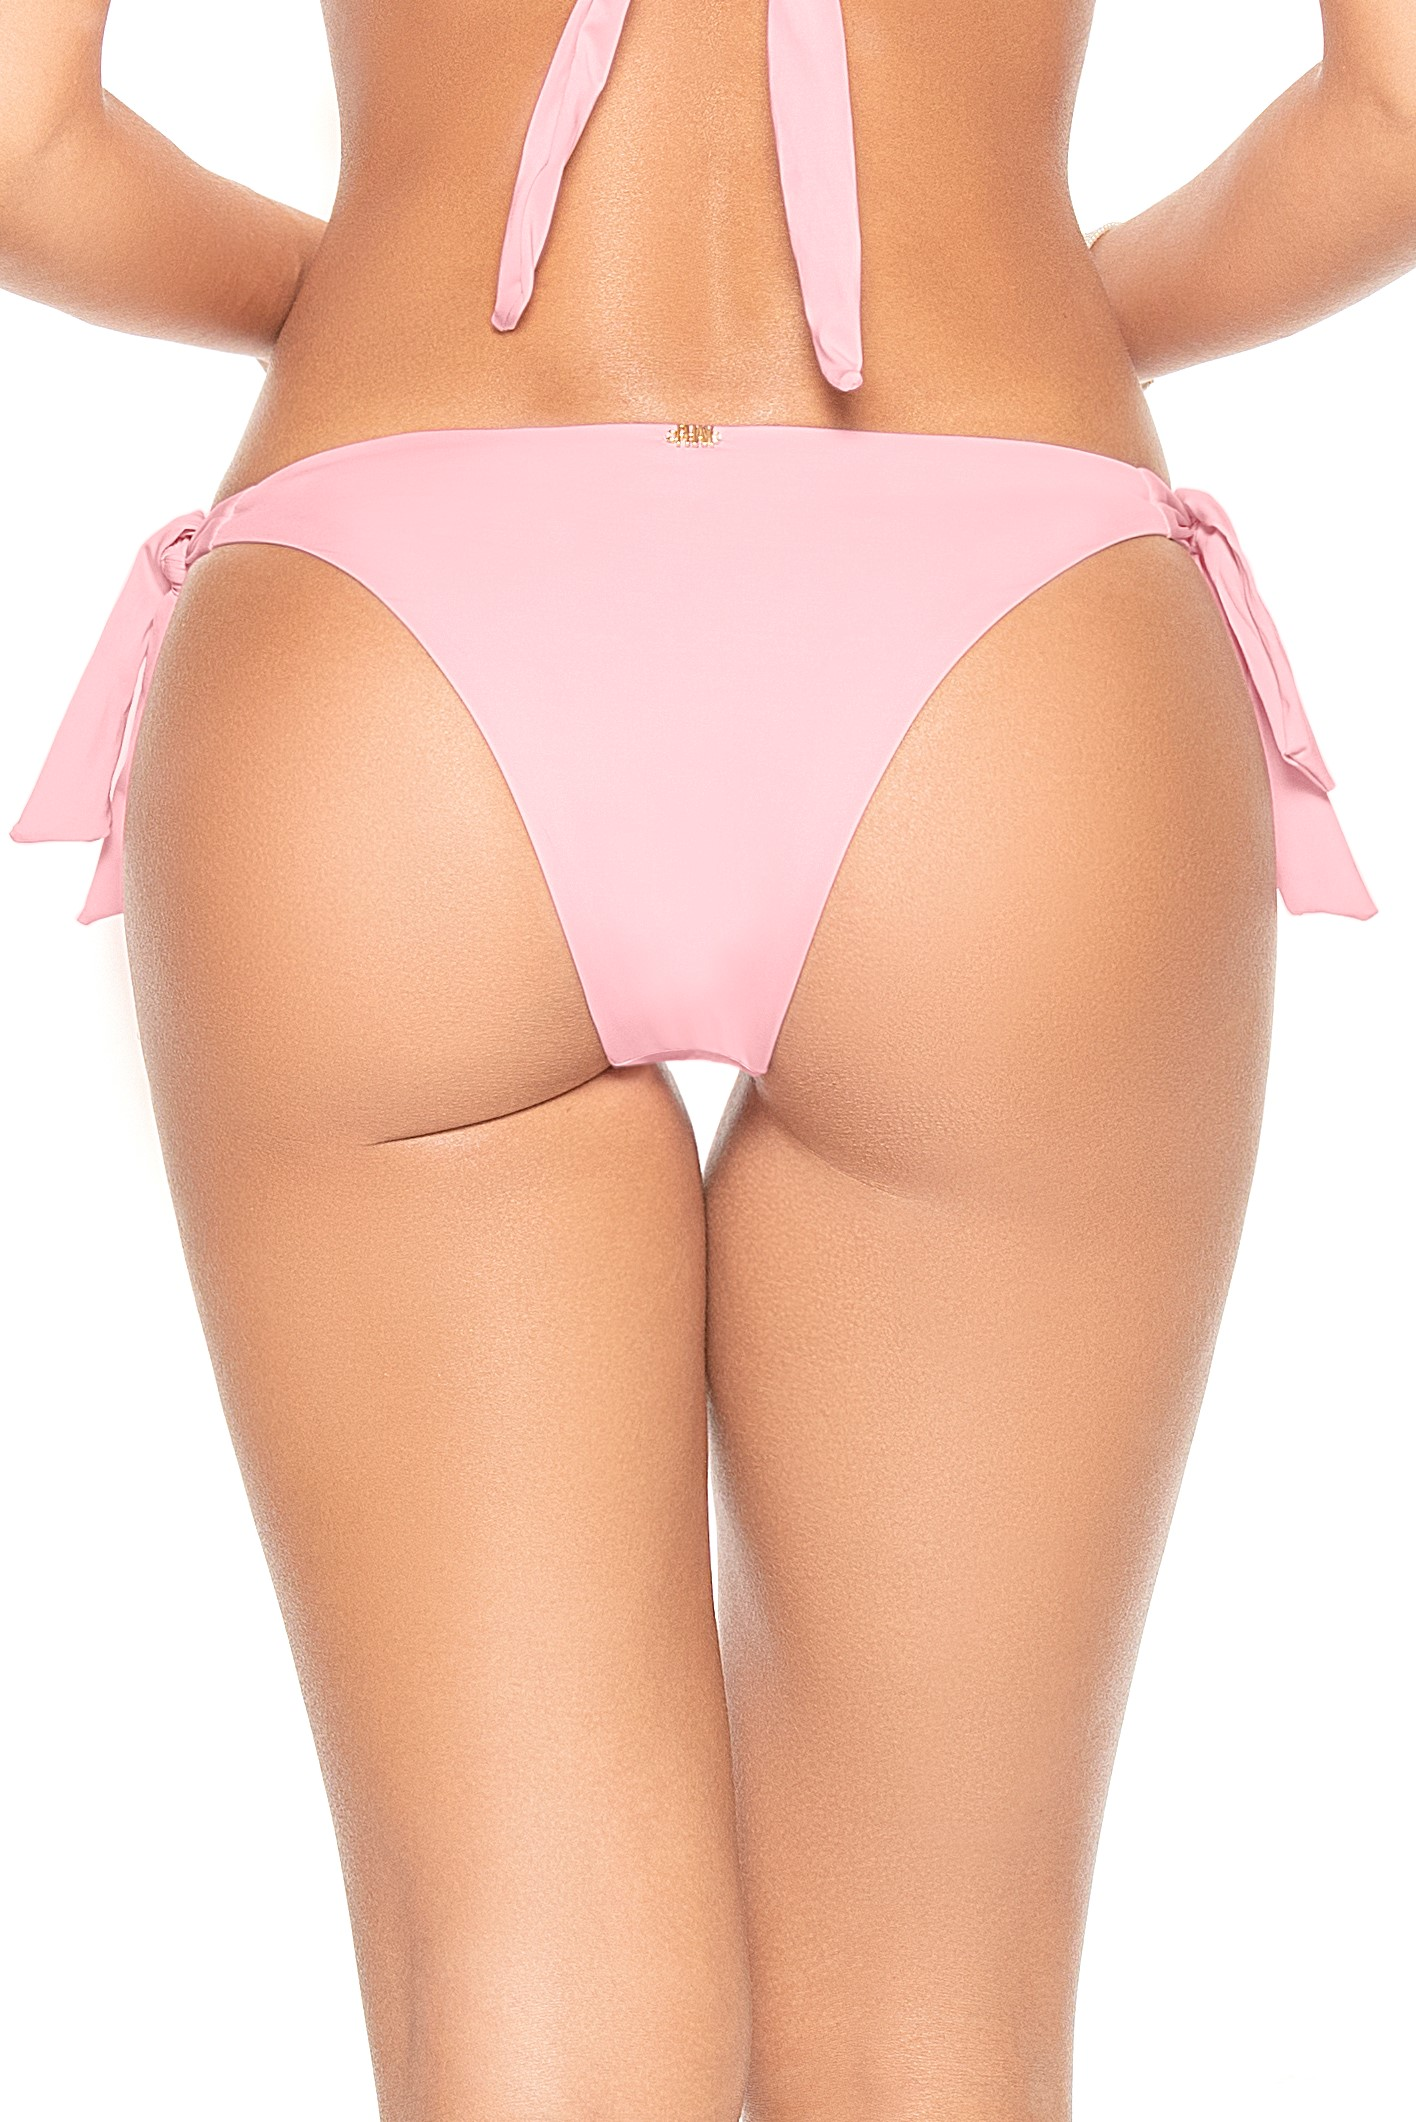 Phax Macarons Latin Bikini Bottom -large-Roos